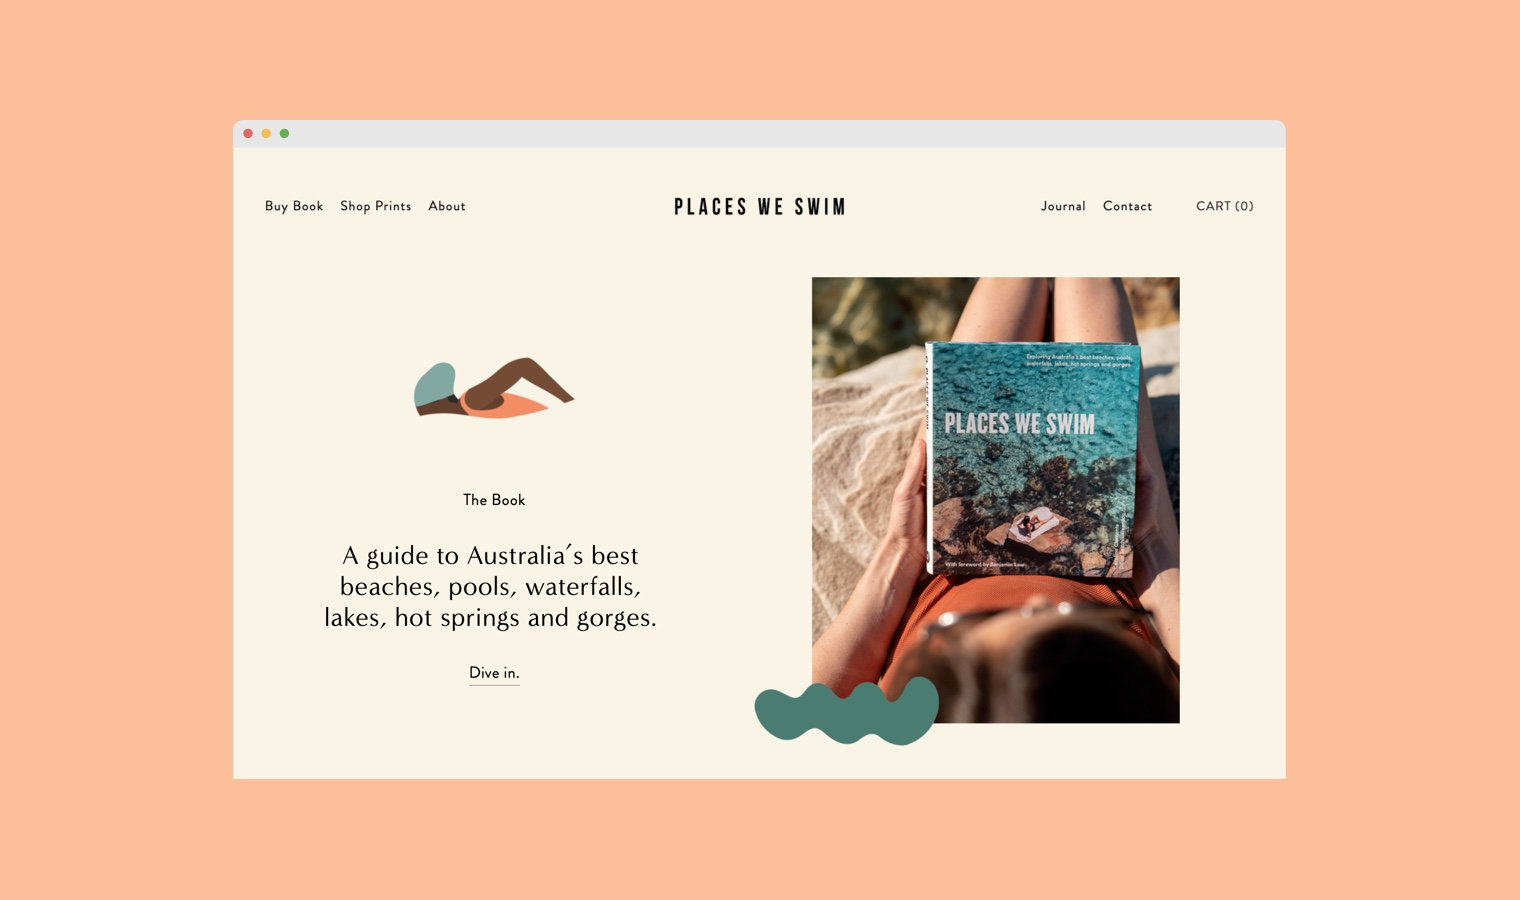 places-we-swim-book-ethical-design-agency-sustainable-brands-graphic-designer-sydney-byron-bay-bondi-melbourne-branding.jpg